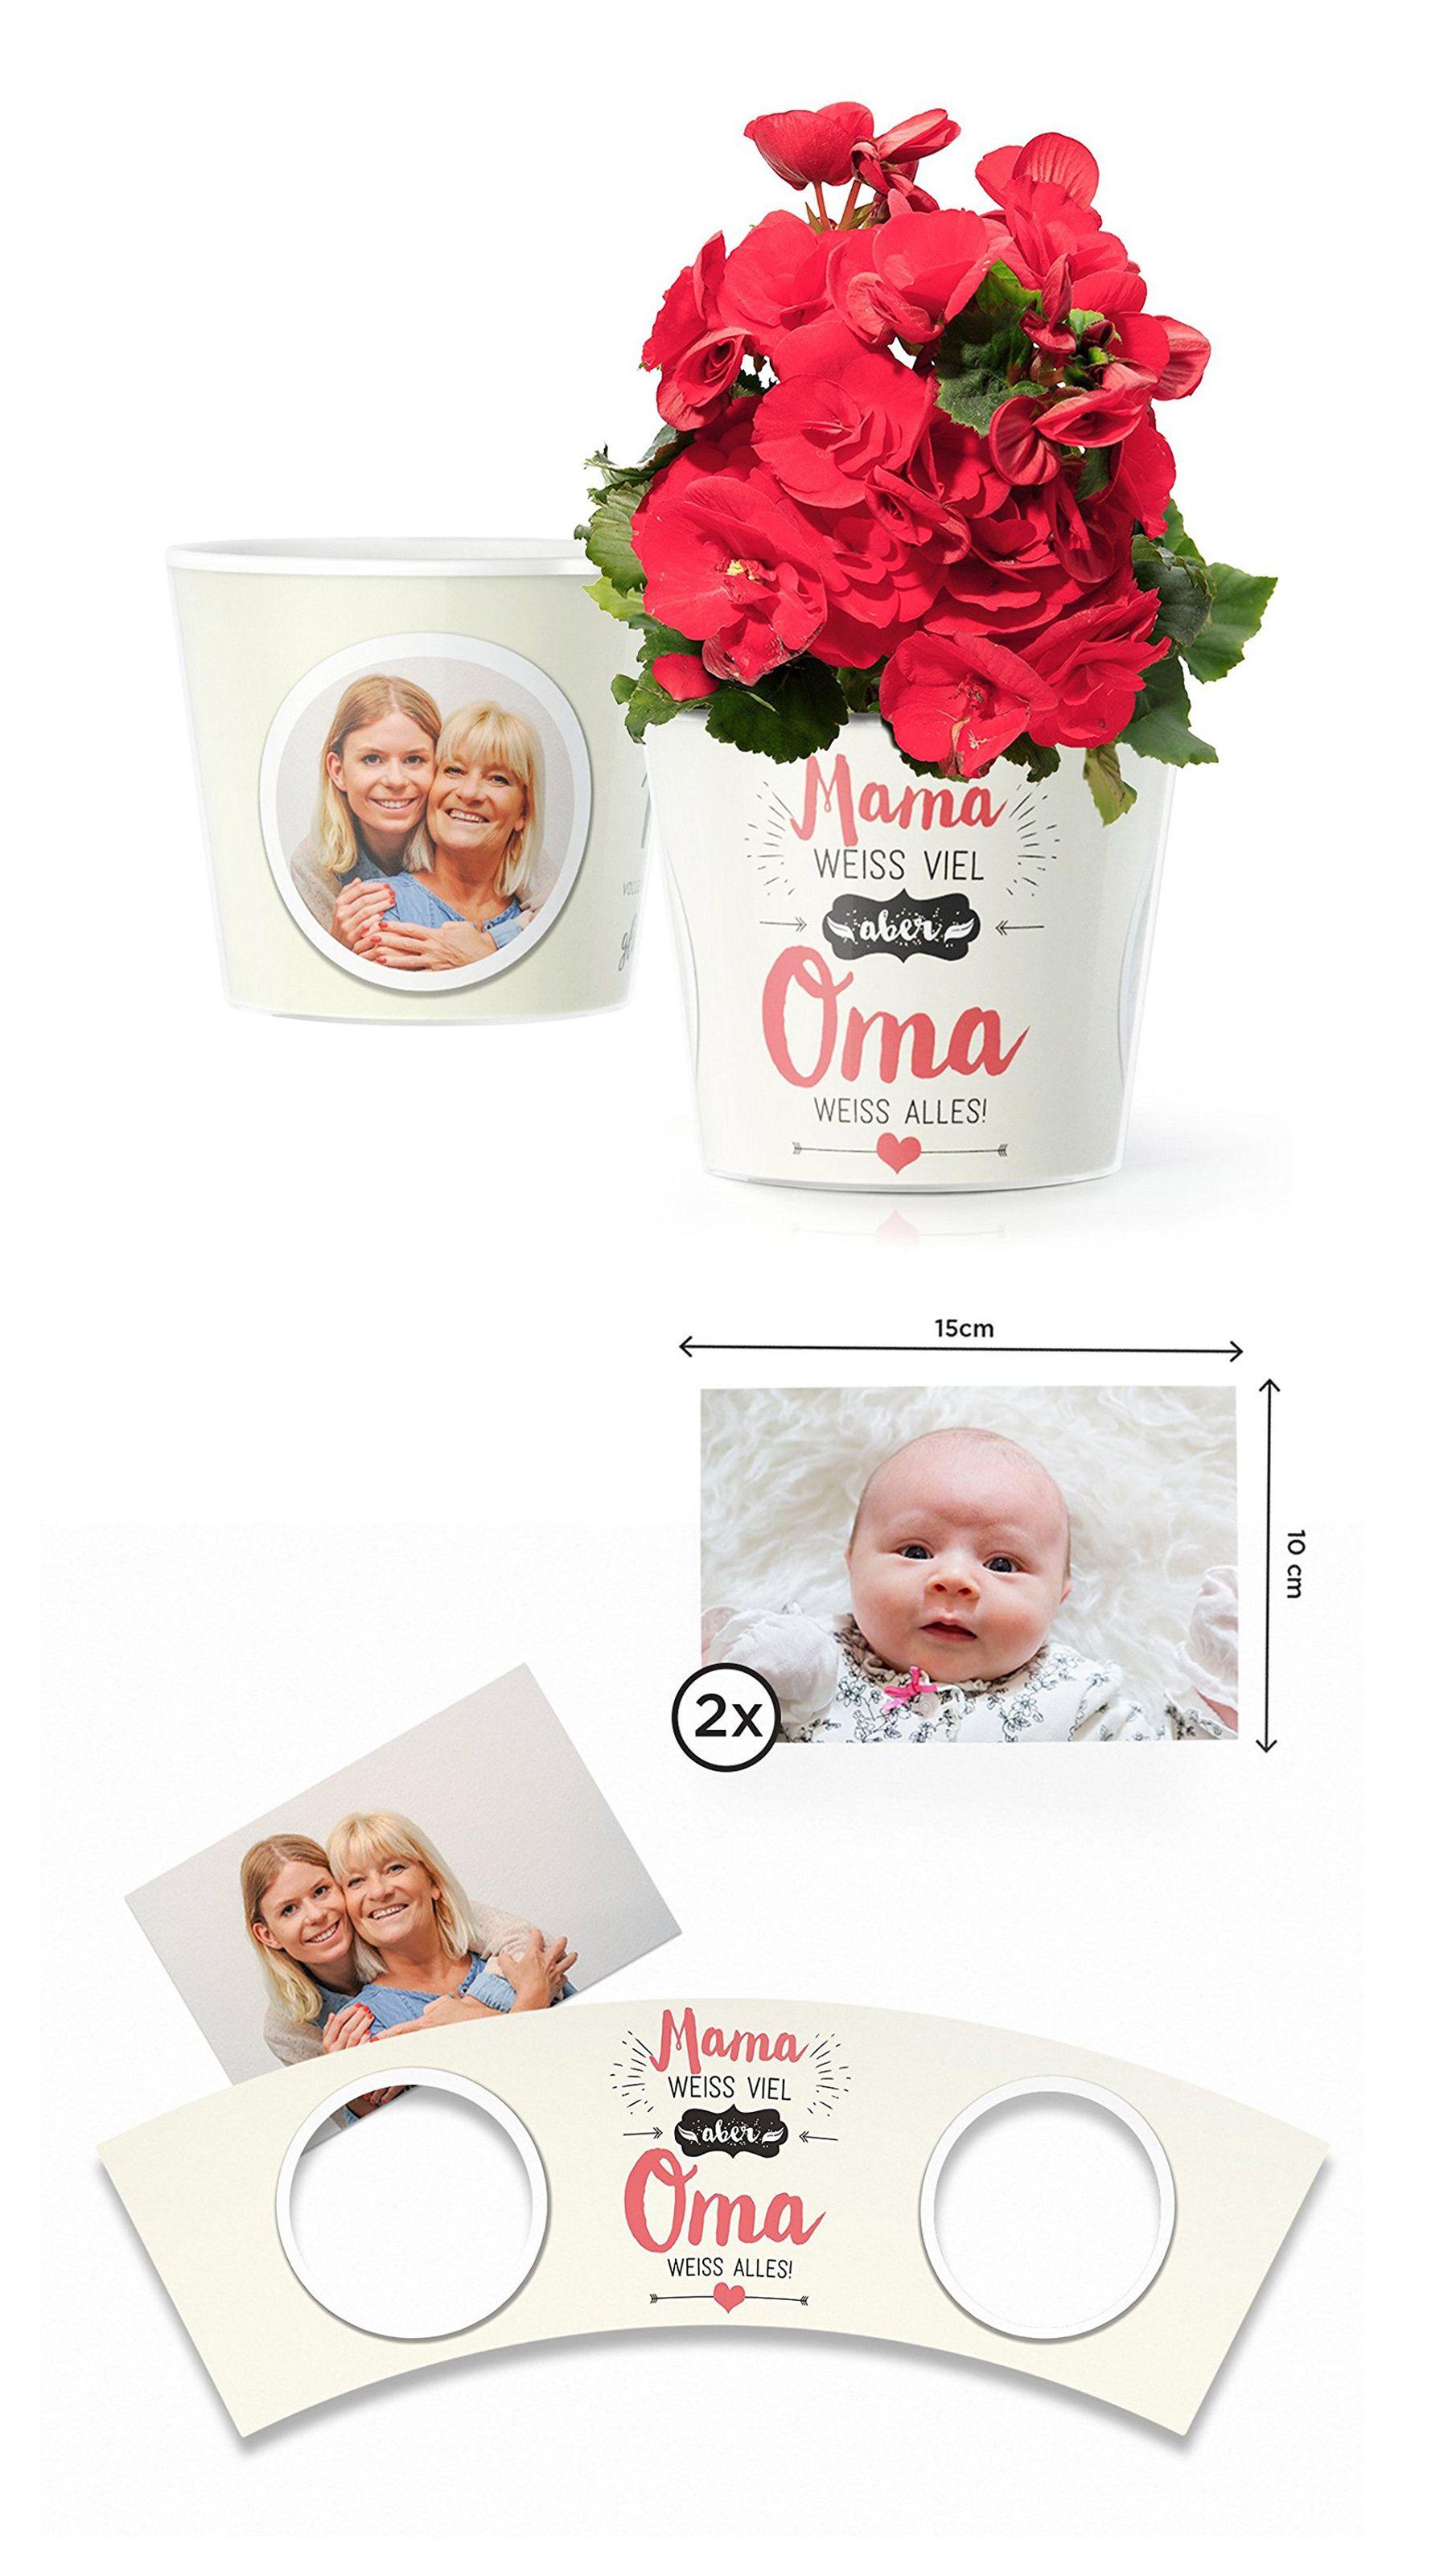 Mama weiss viel aber Oma weiss alles! Blumentopf (ø16cm) | Muttertag ...